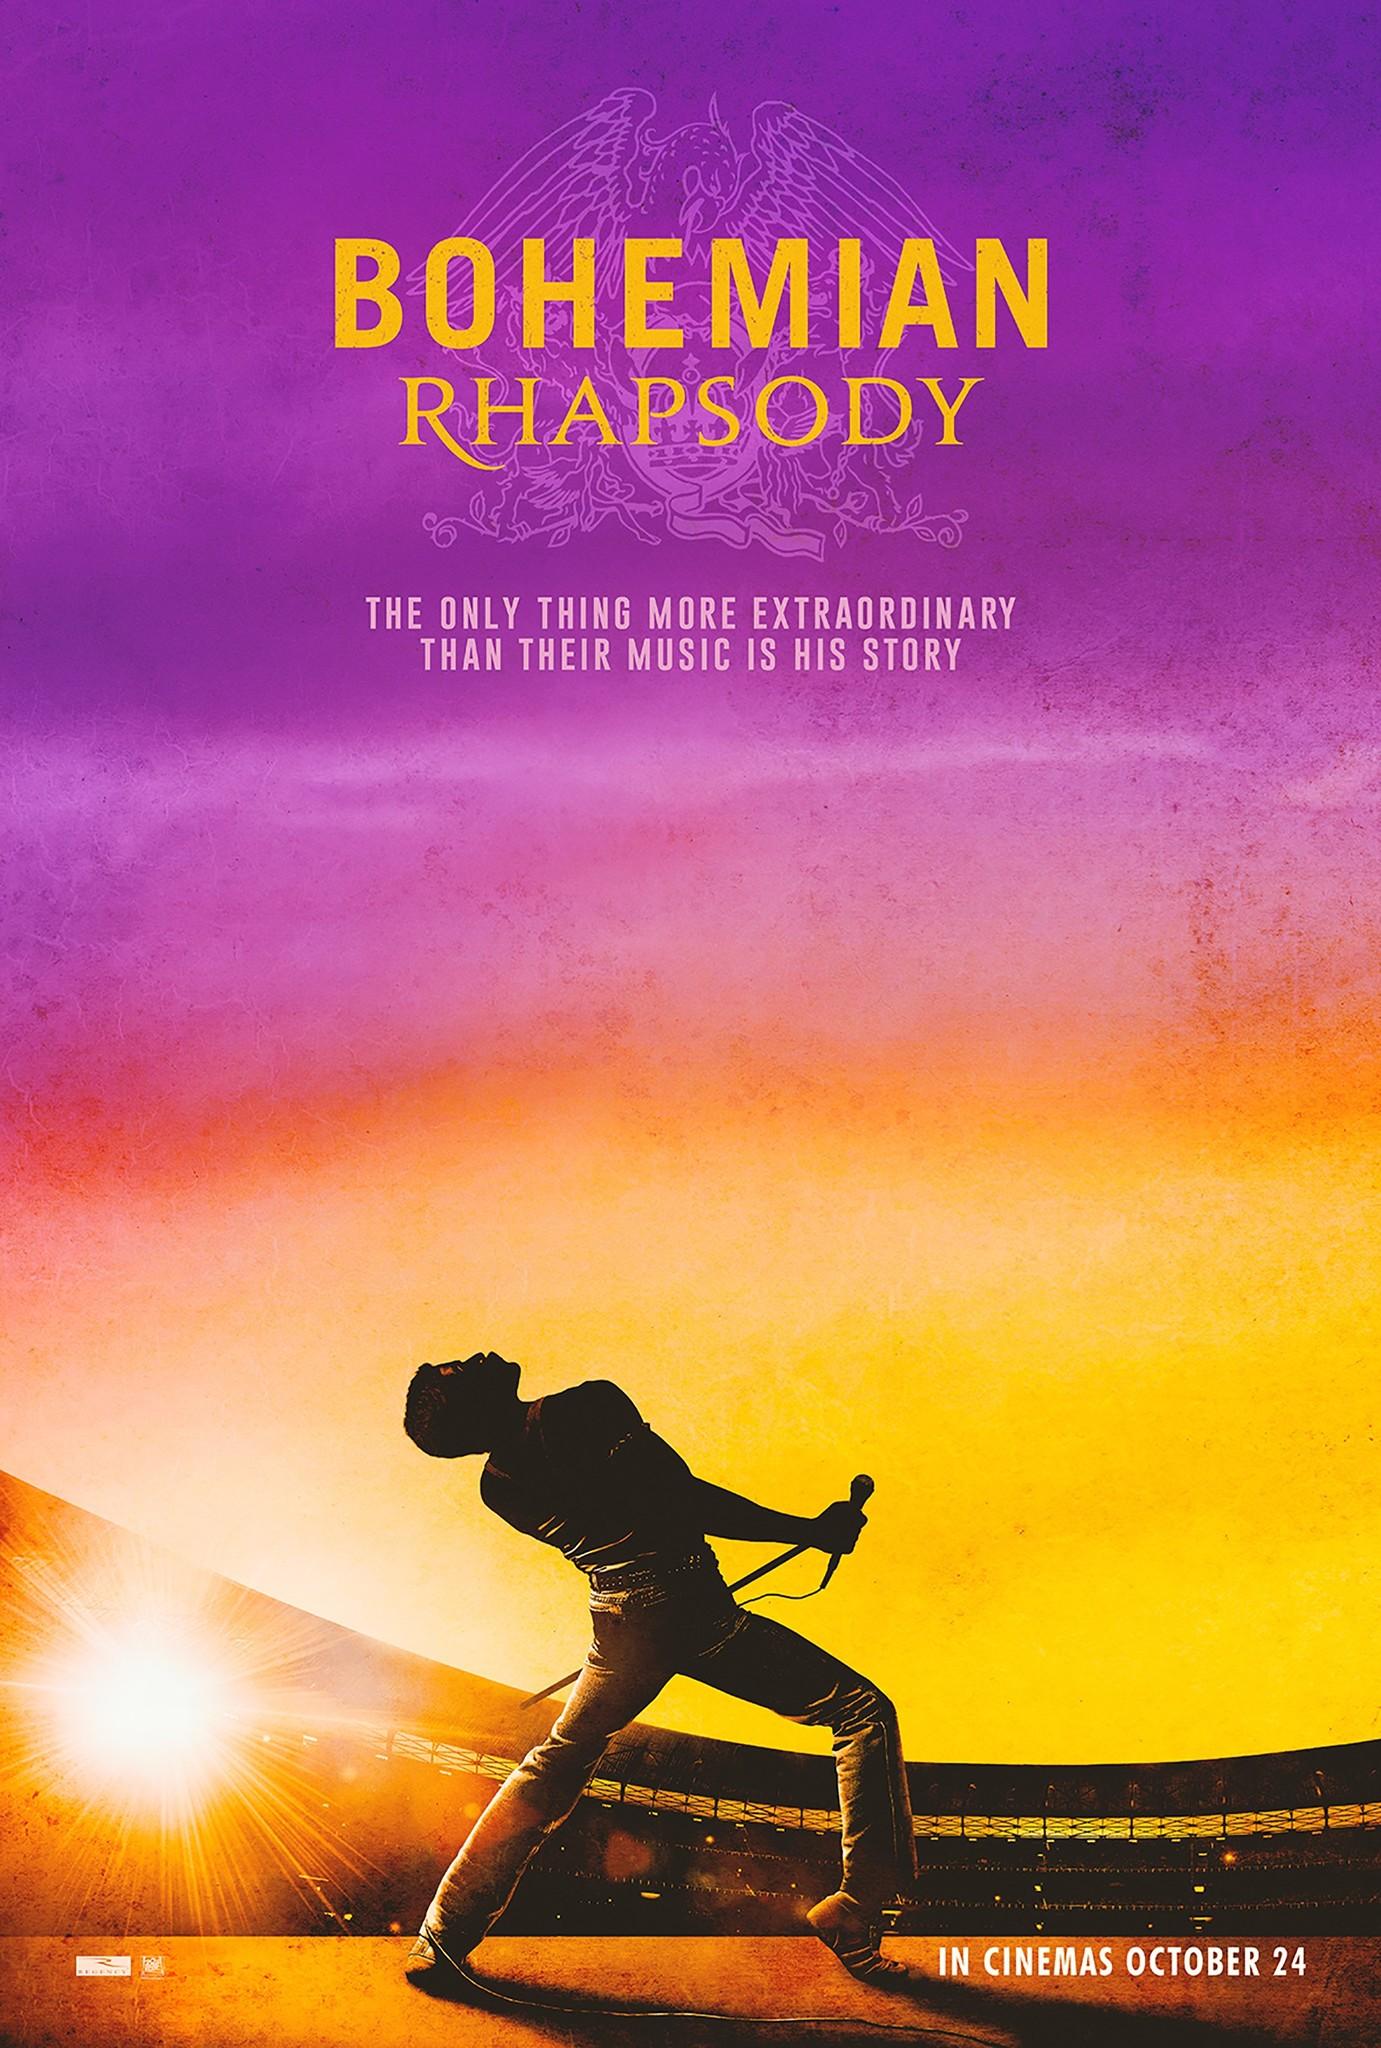 Bohemian Rhapsody Film Gesang